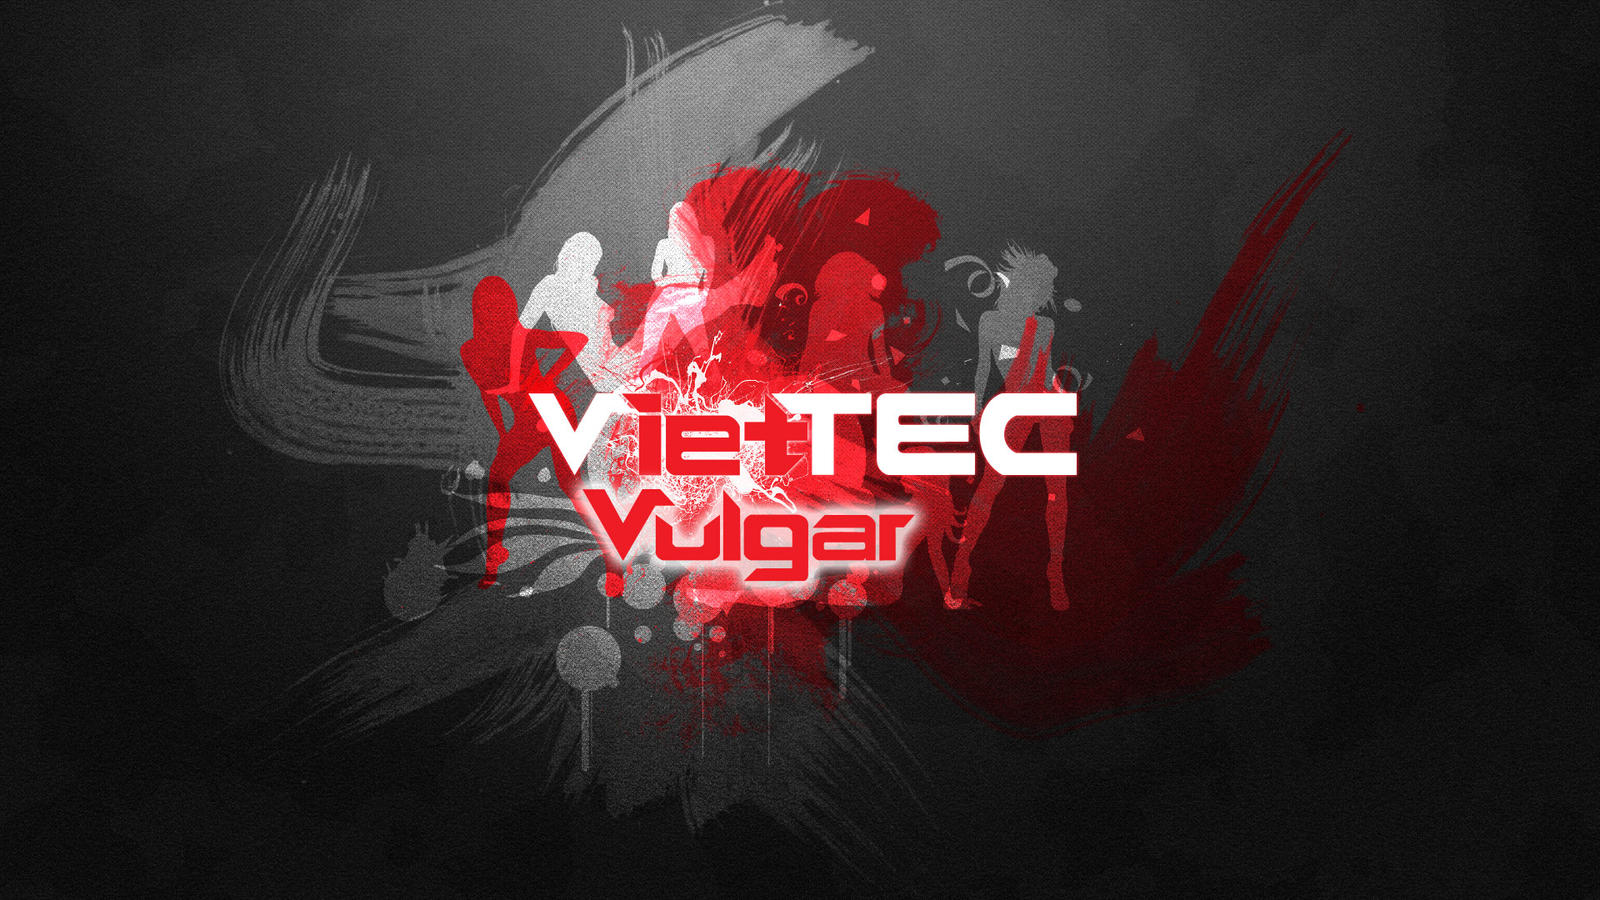 VietTEC Vulgar by haomaru87